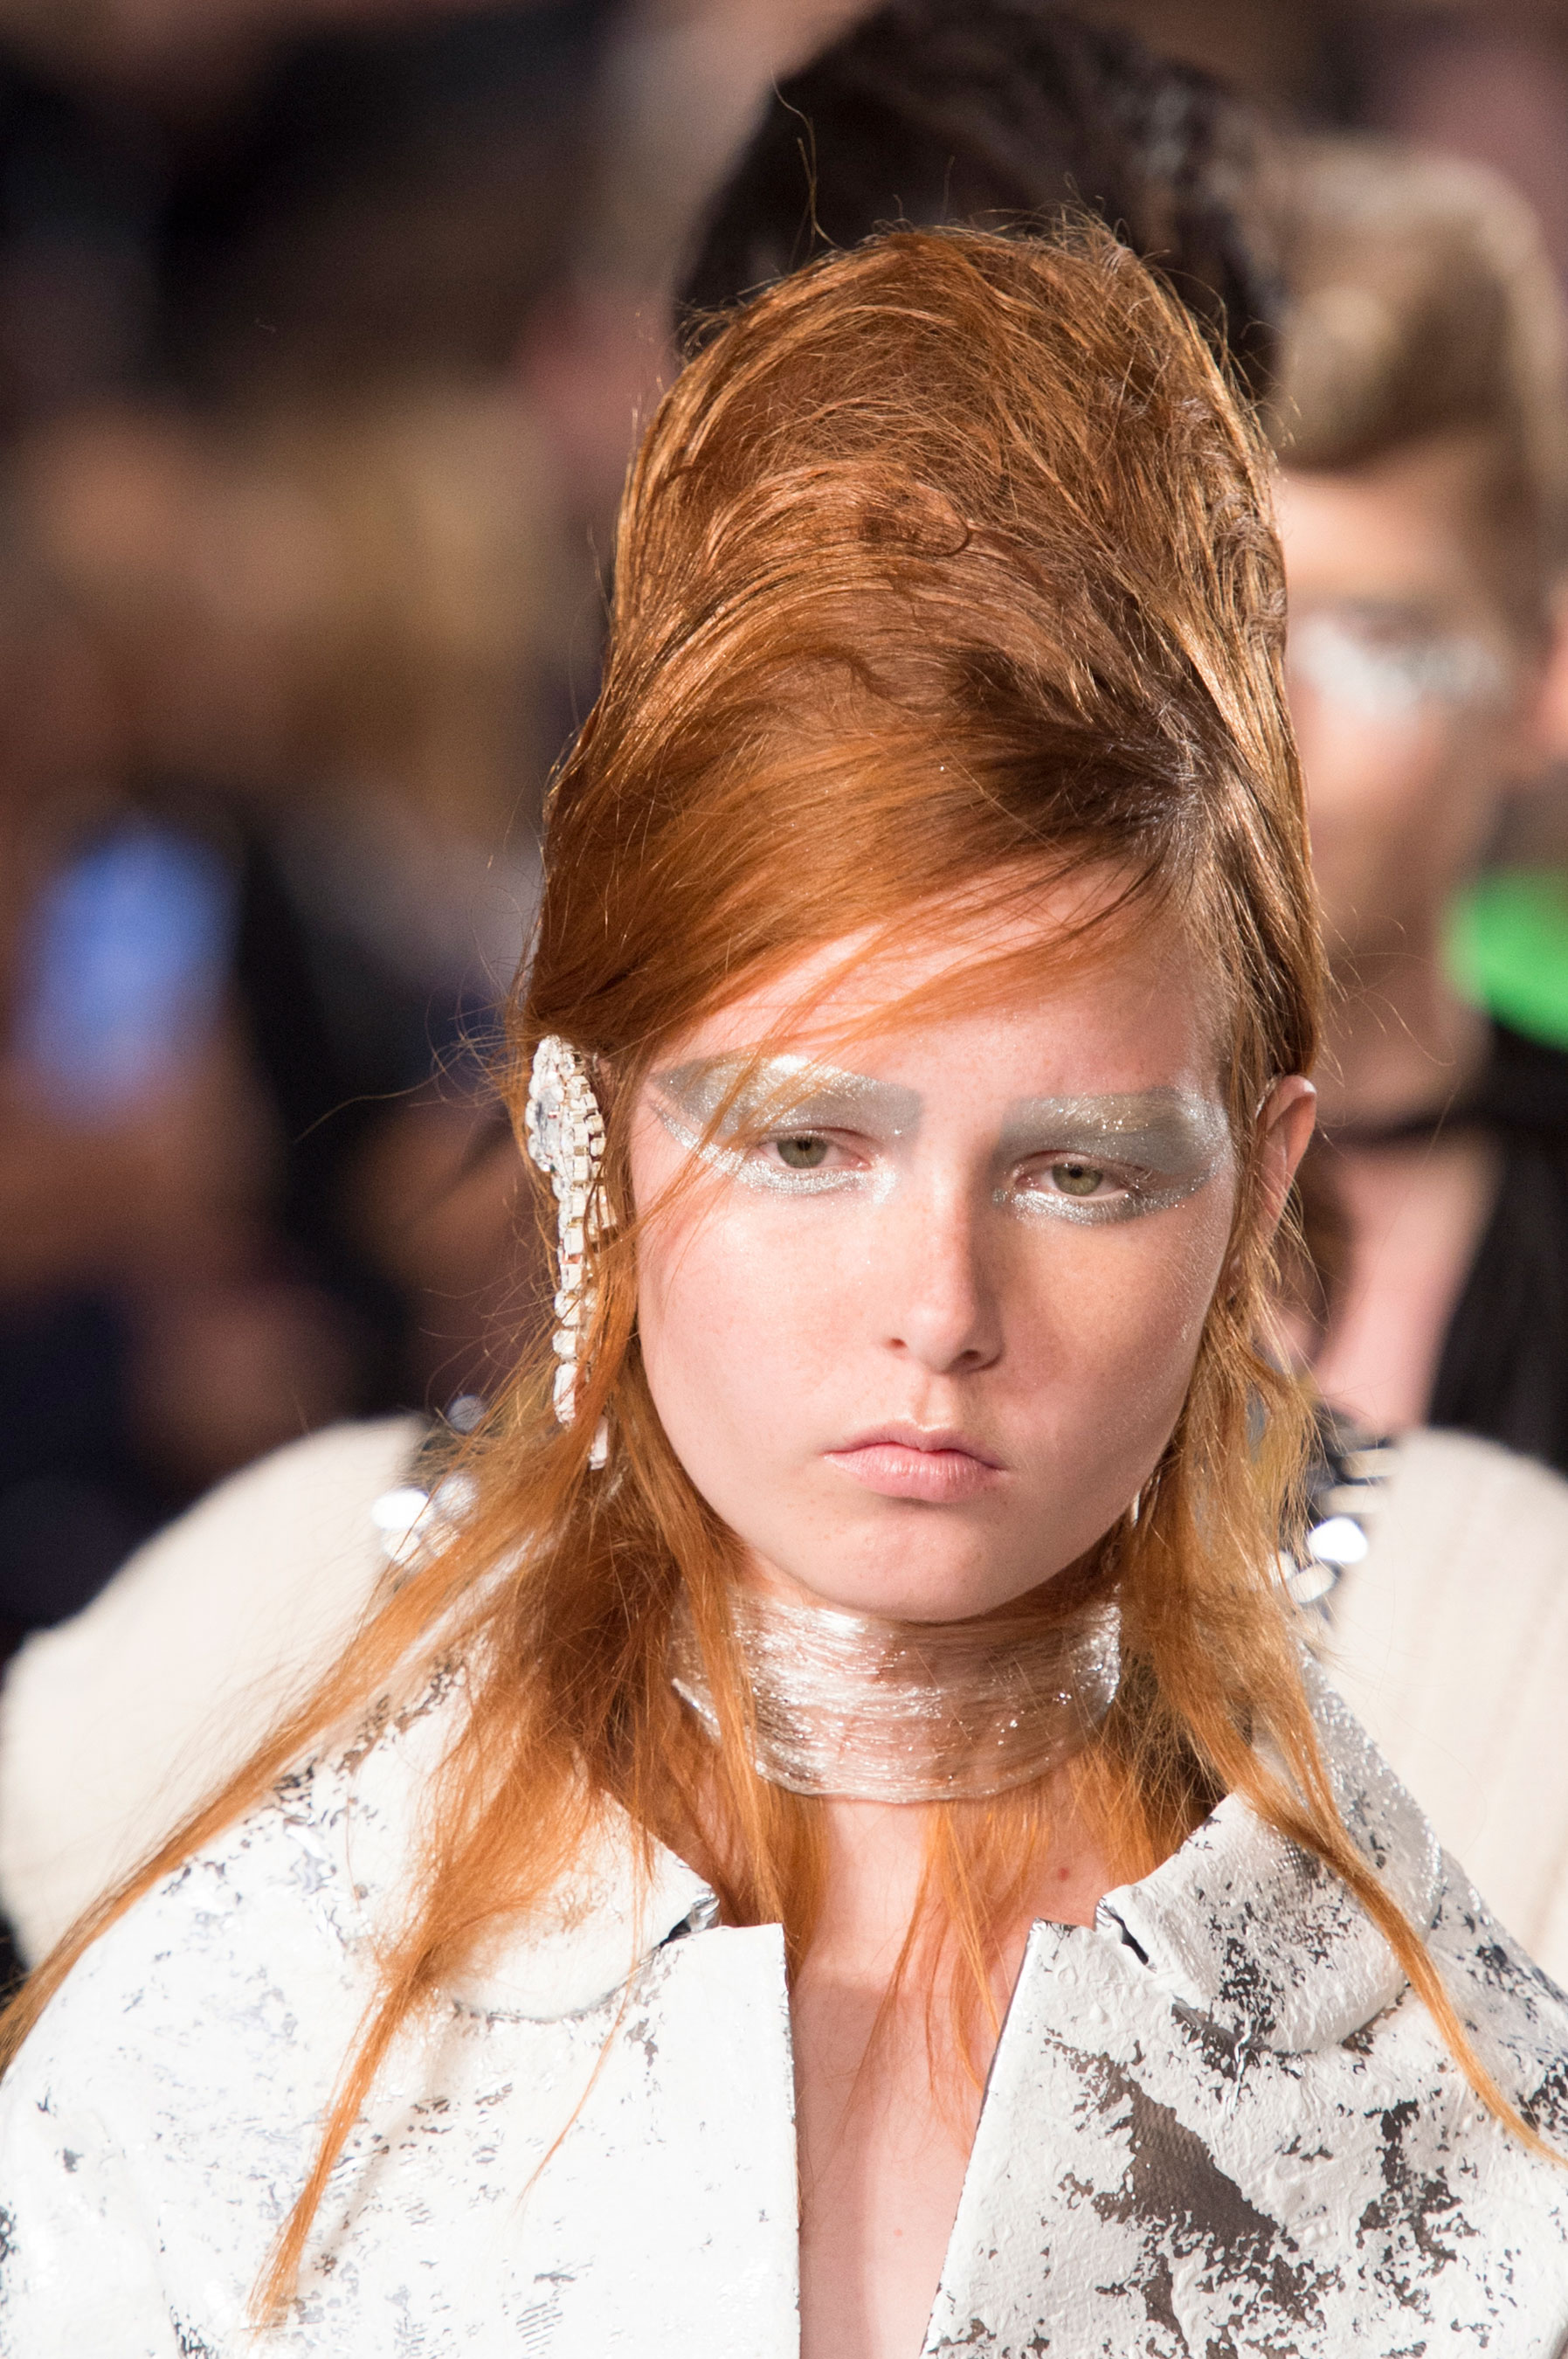 Maison-Margiela-spring-2016-runway-beauty-fashion-show-the-impression-073